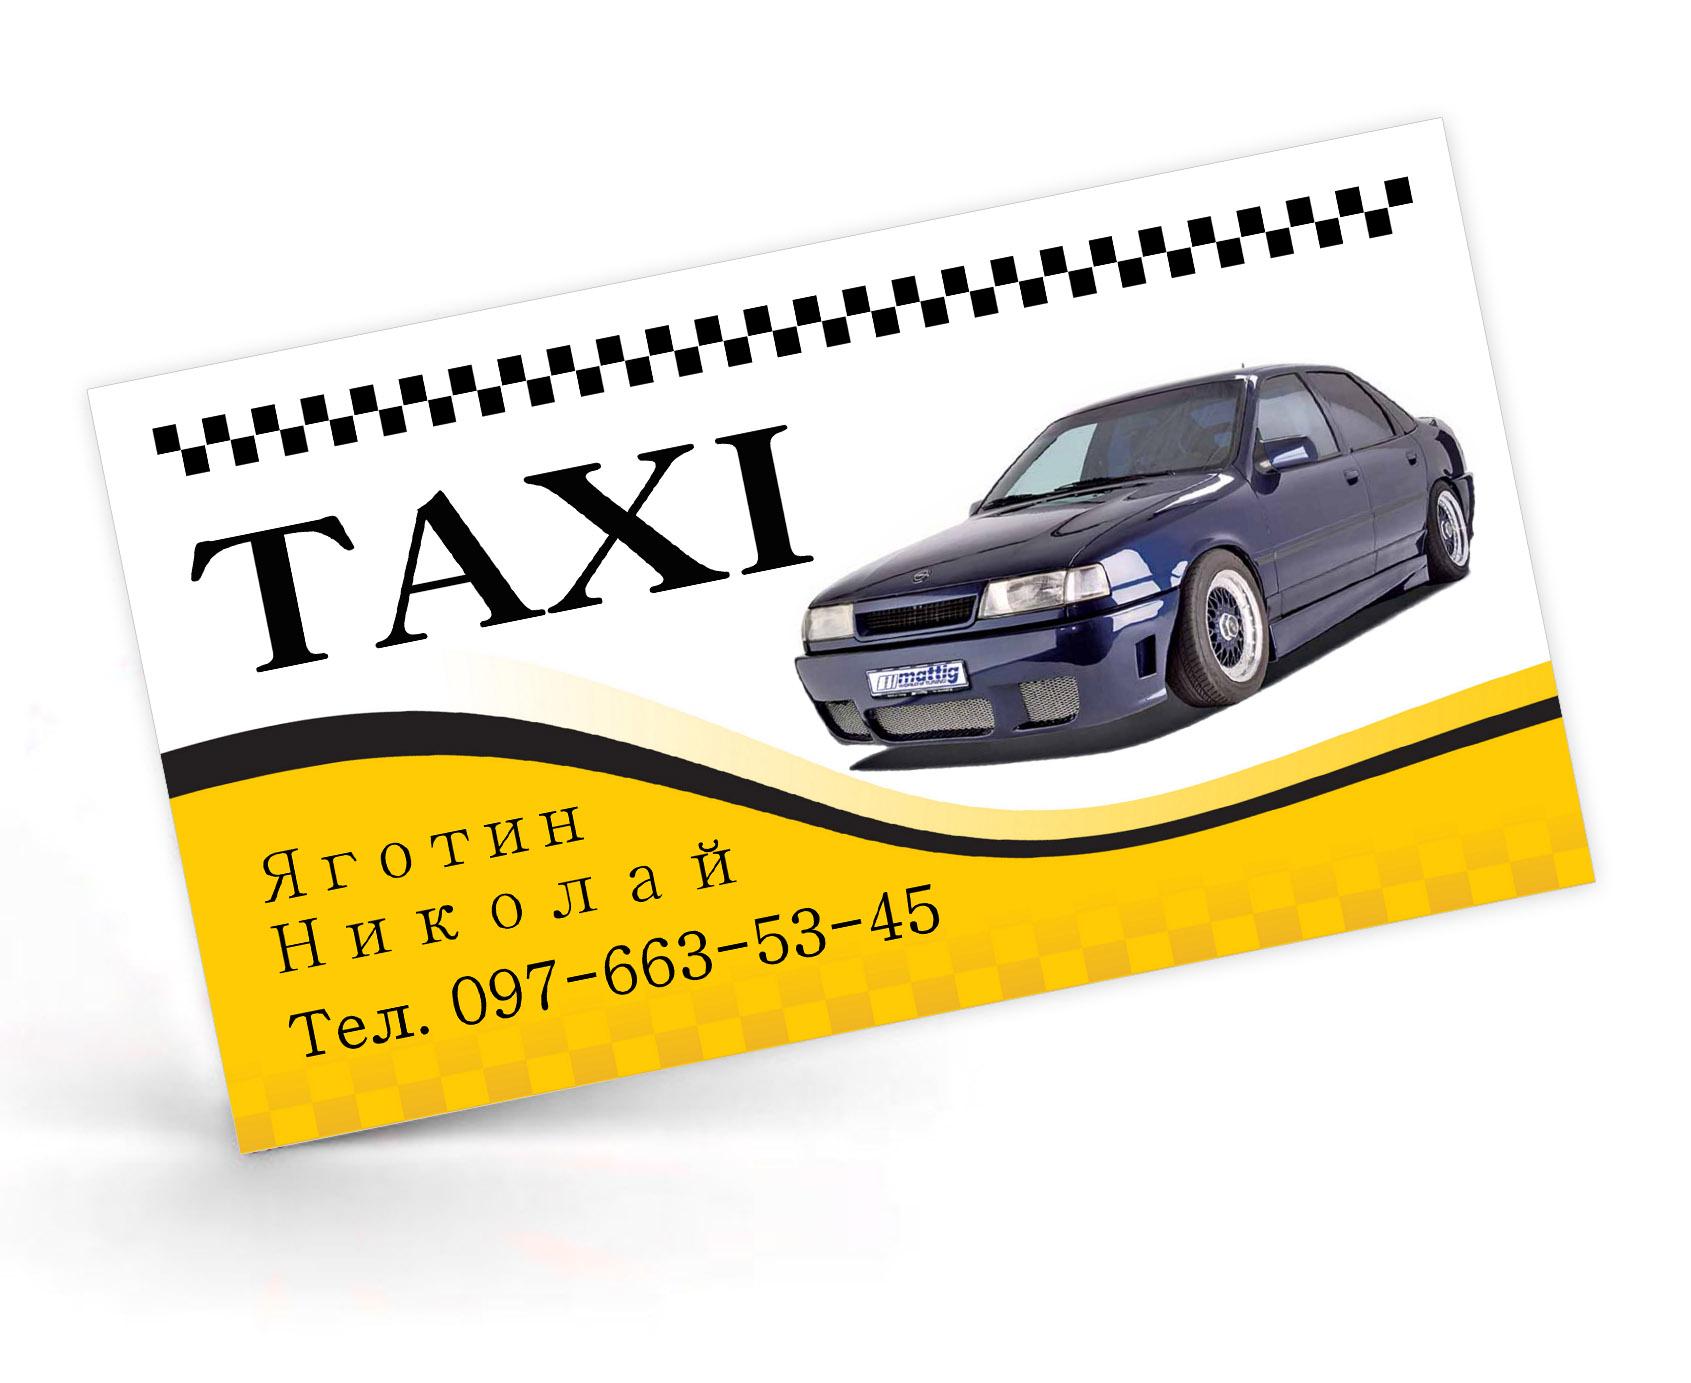 Визитки для такси своими руками